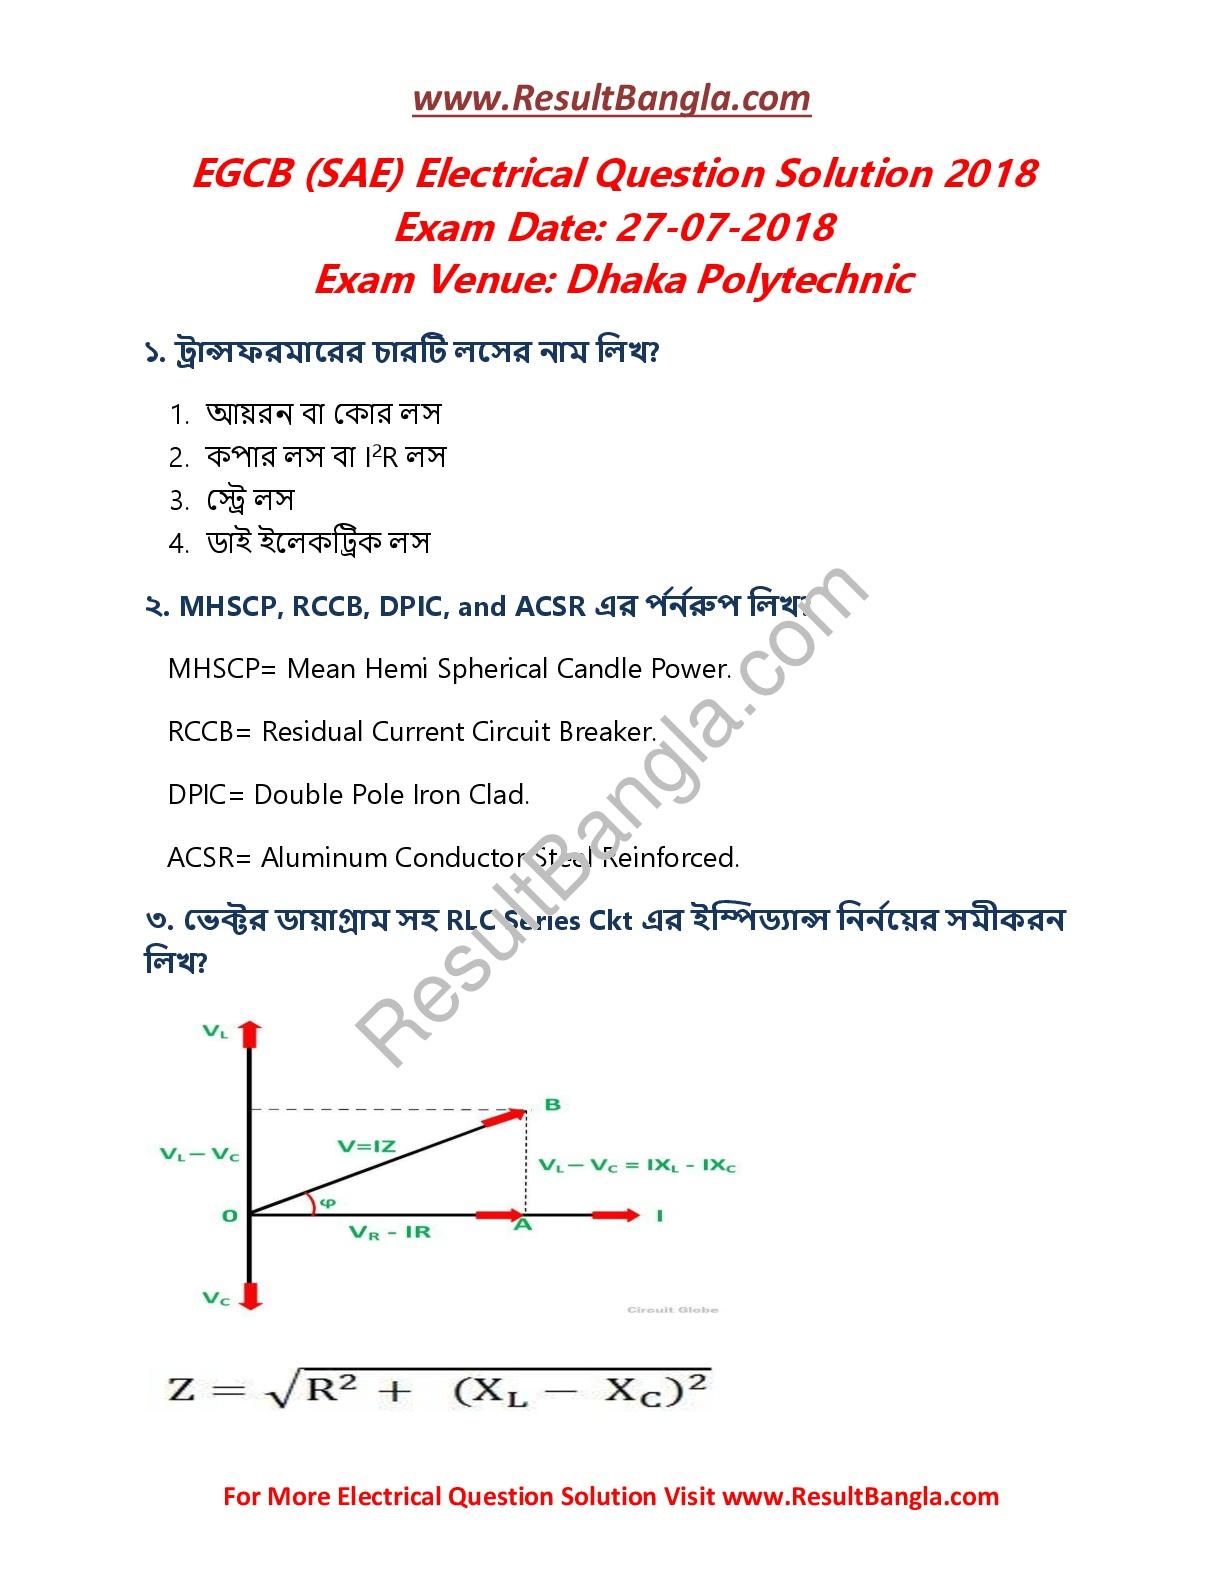 EGCB Job Question Solution 2018